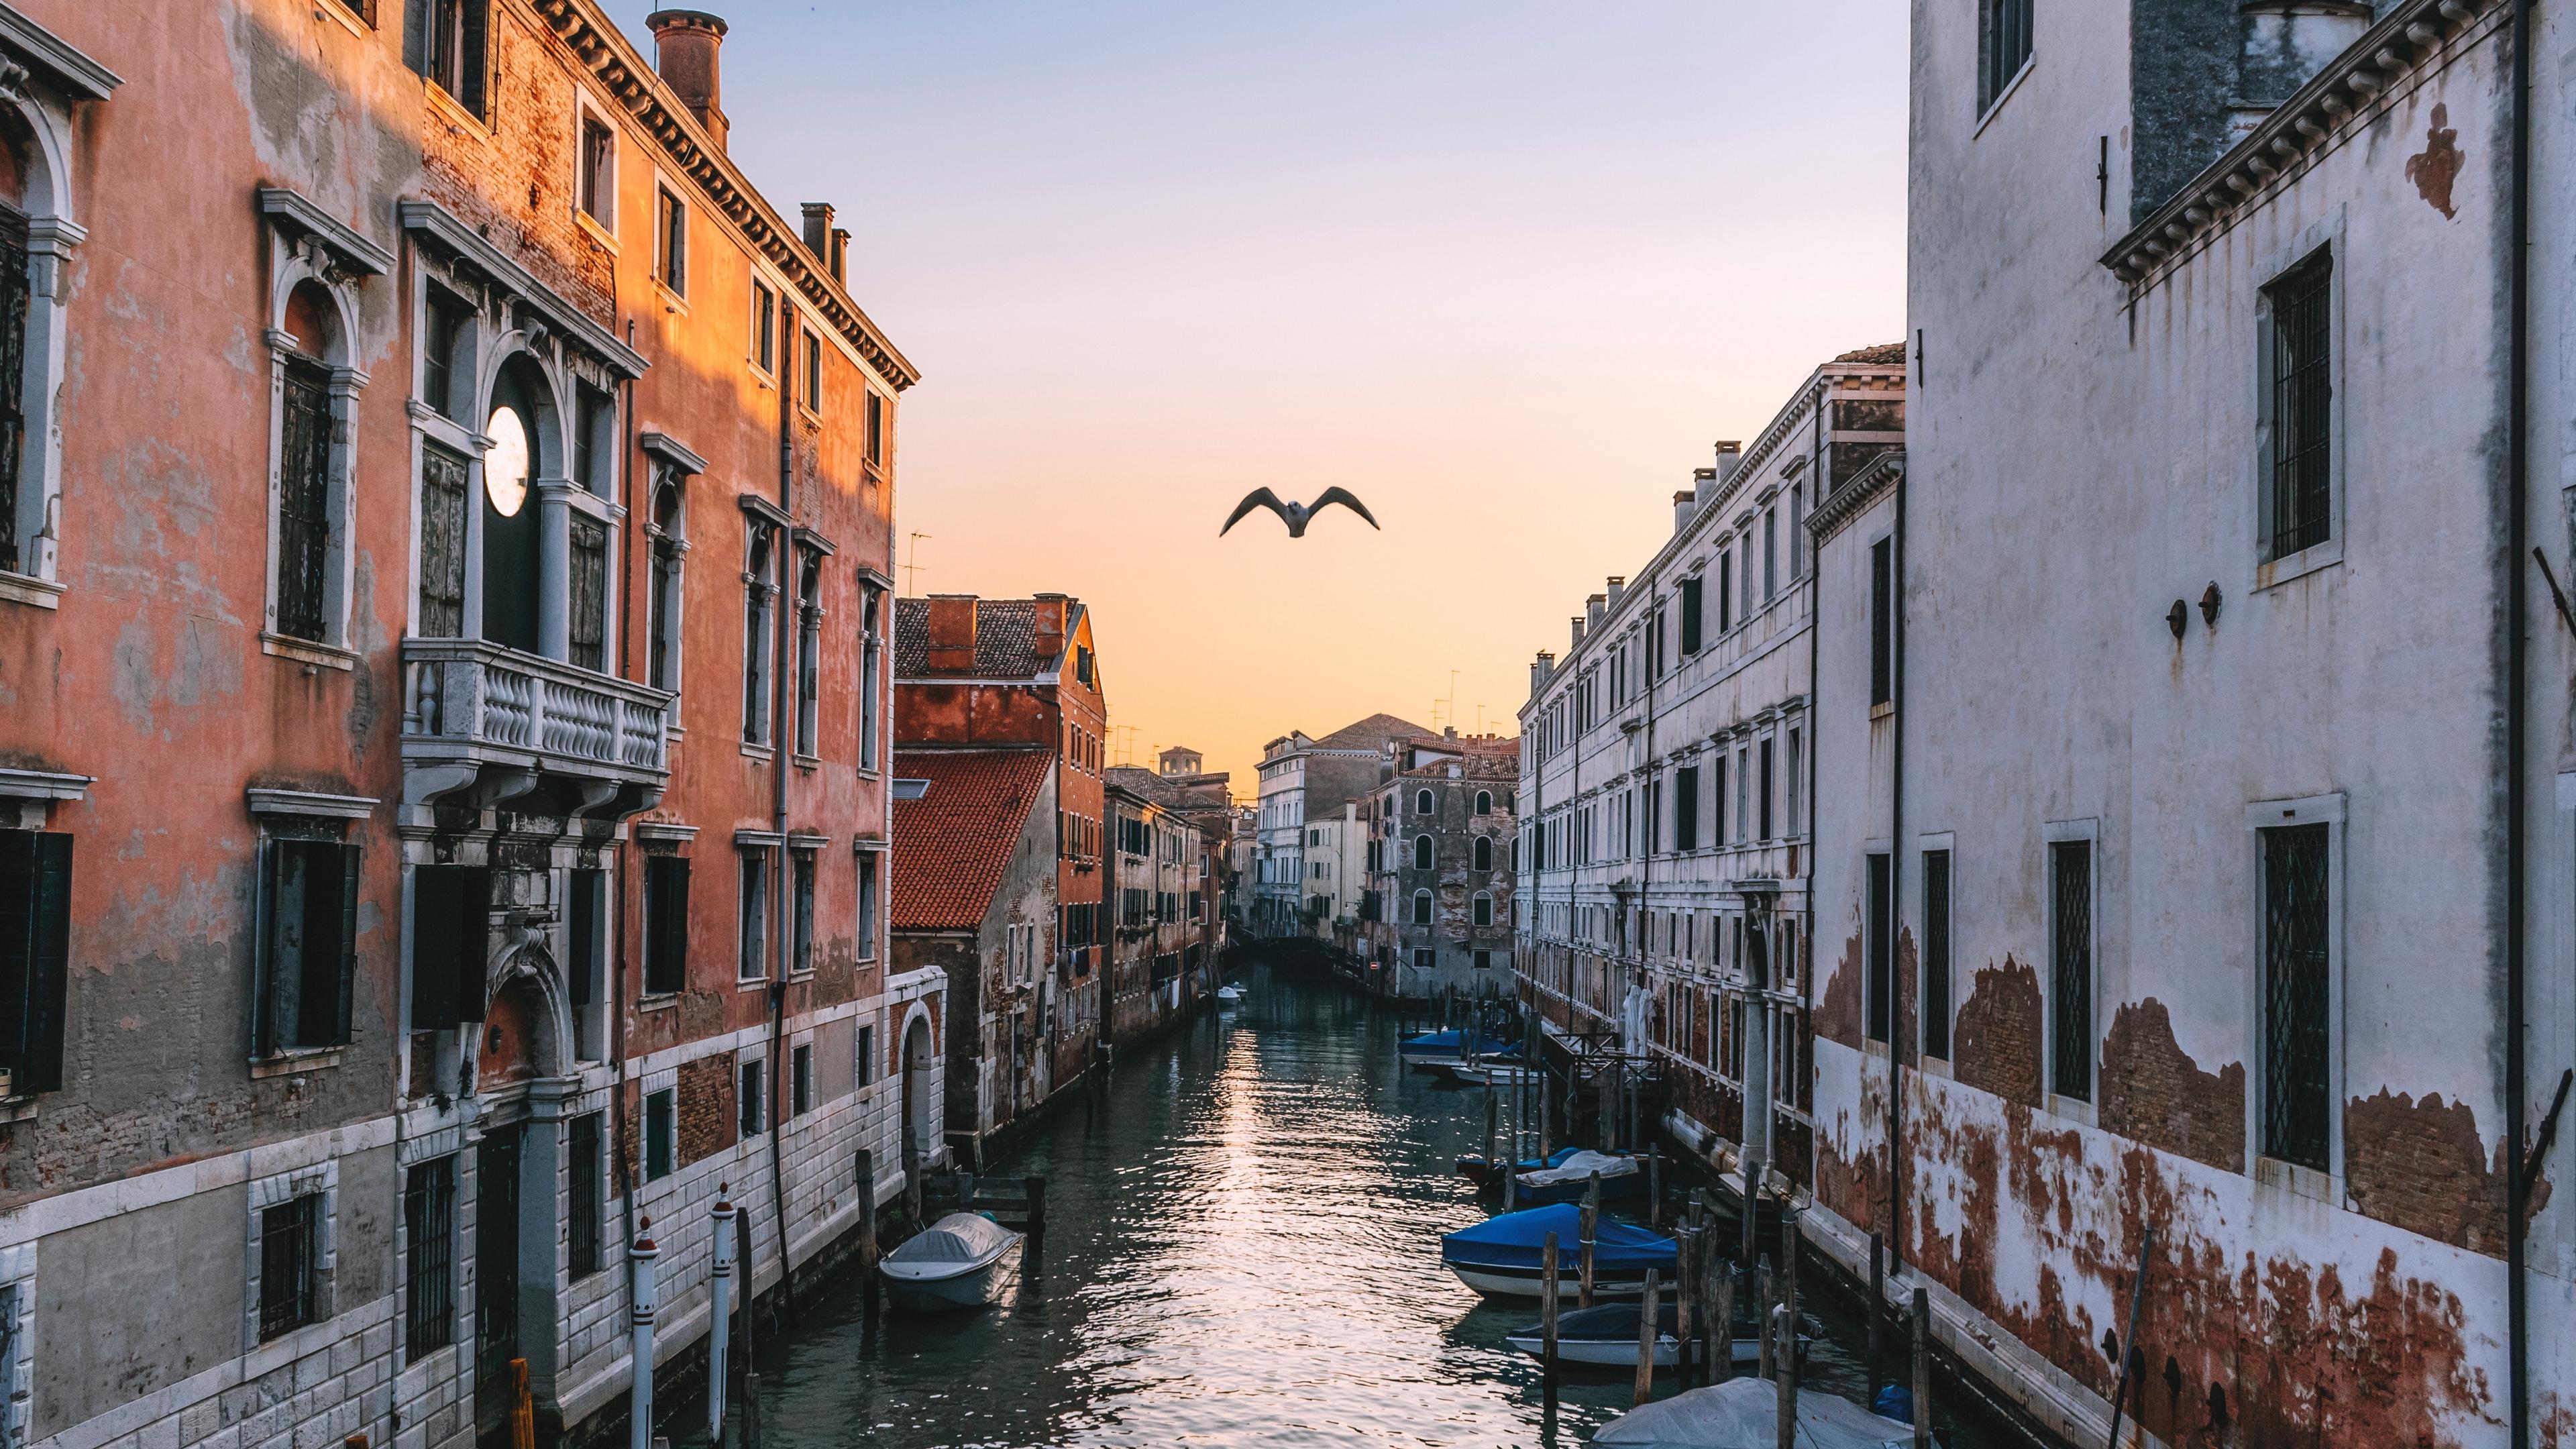 venice italy canal seagull river 4k 1538065422 - venice, italy, canal, seagull, river 4k - Venice, Italy, Canal